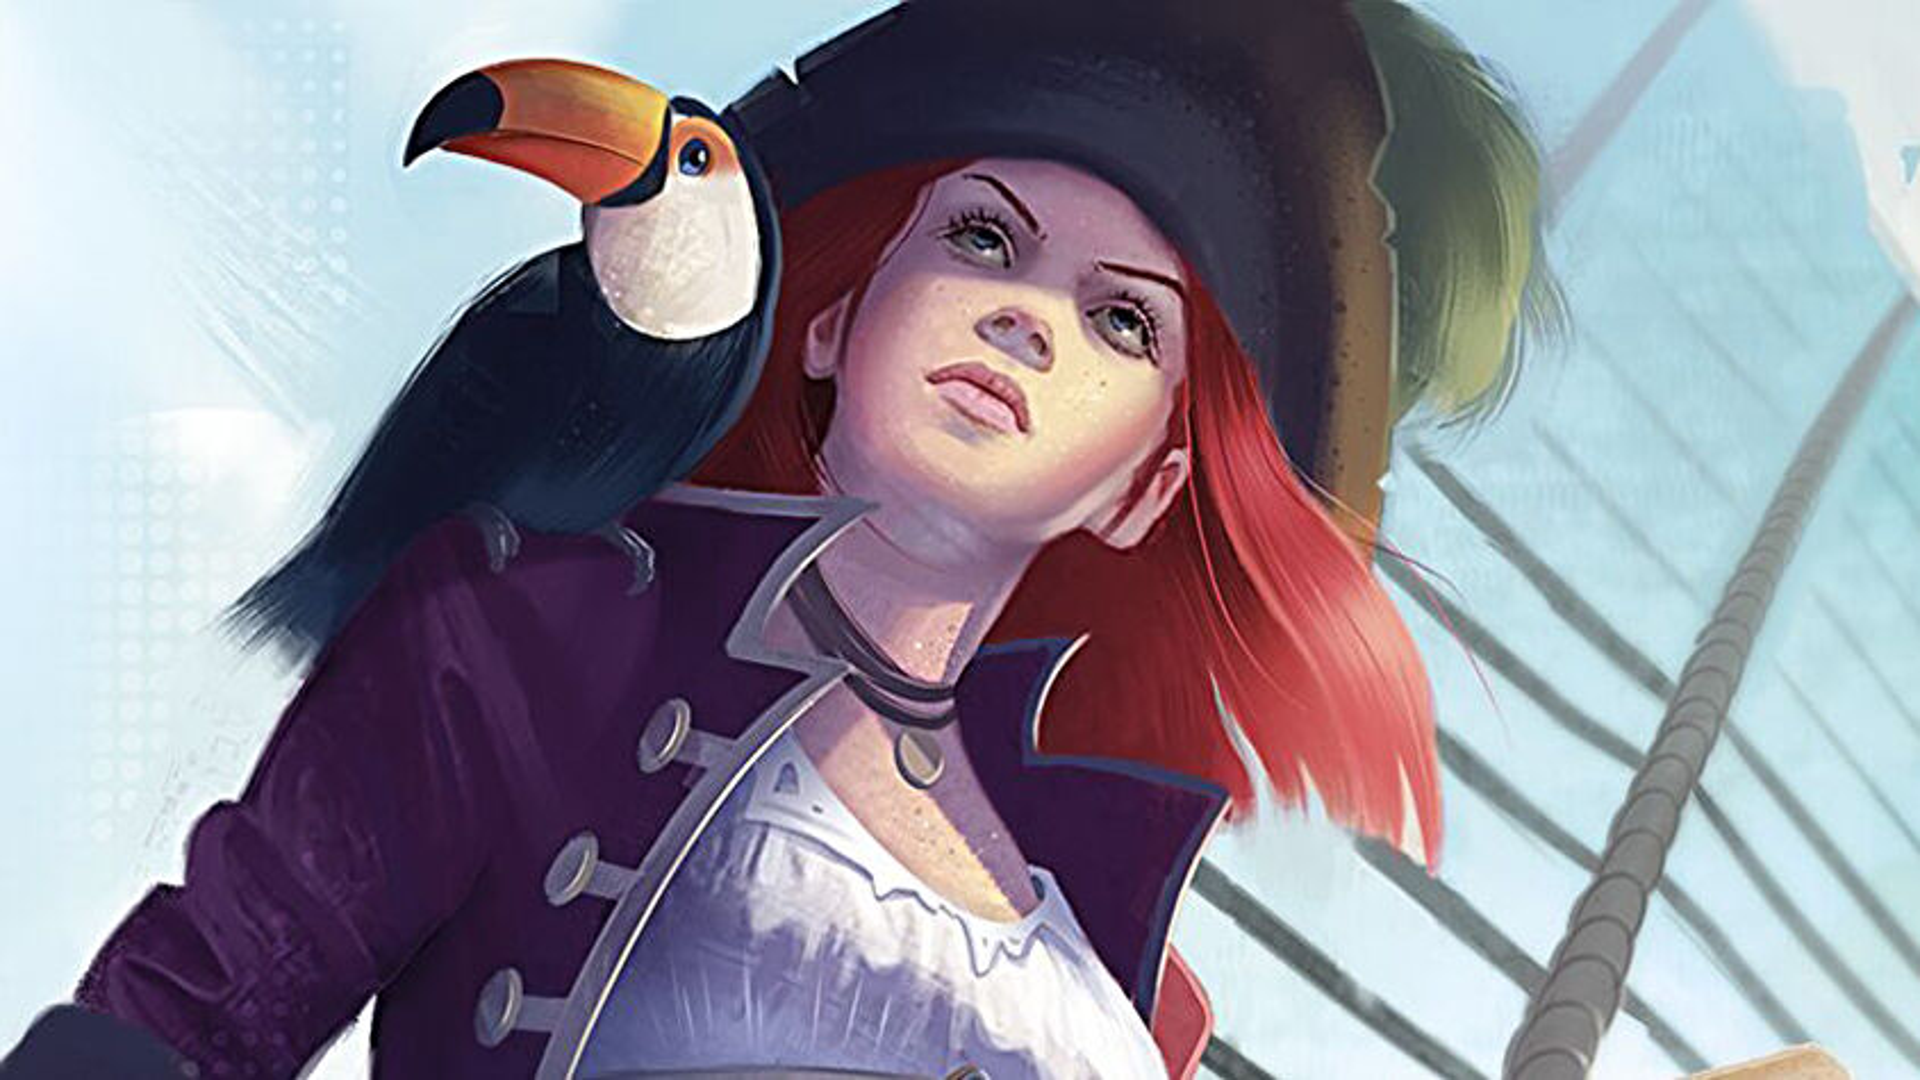 tiny-epic-pirates-board-game-art.jpg